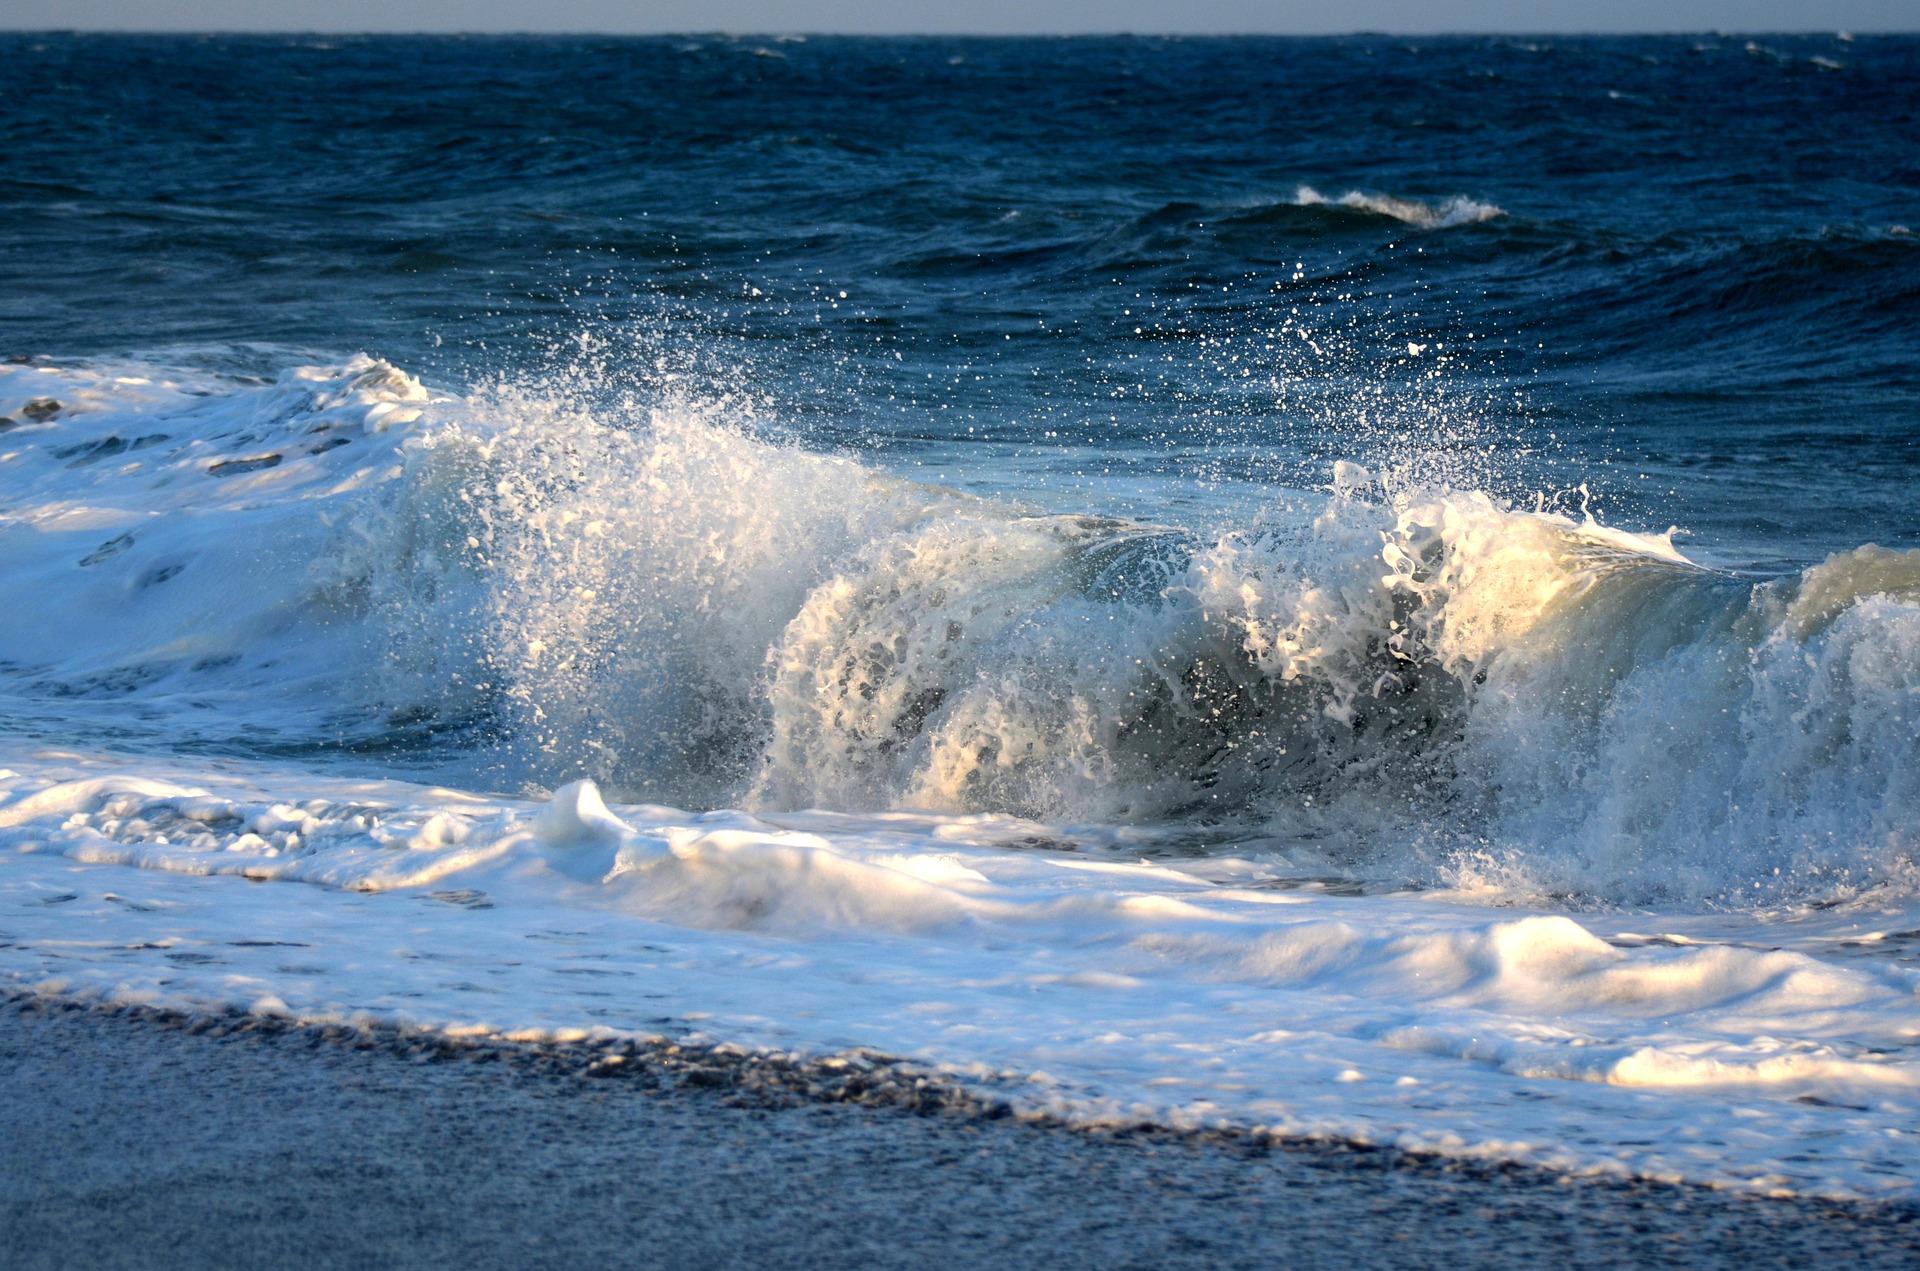 surf-1237537_1920